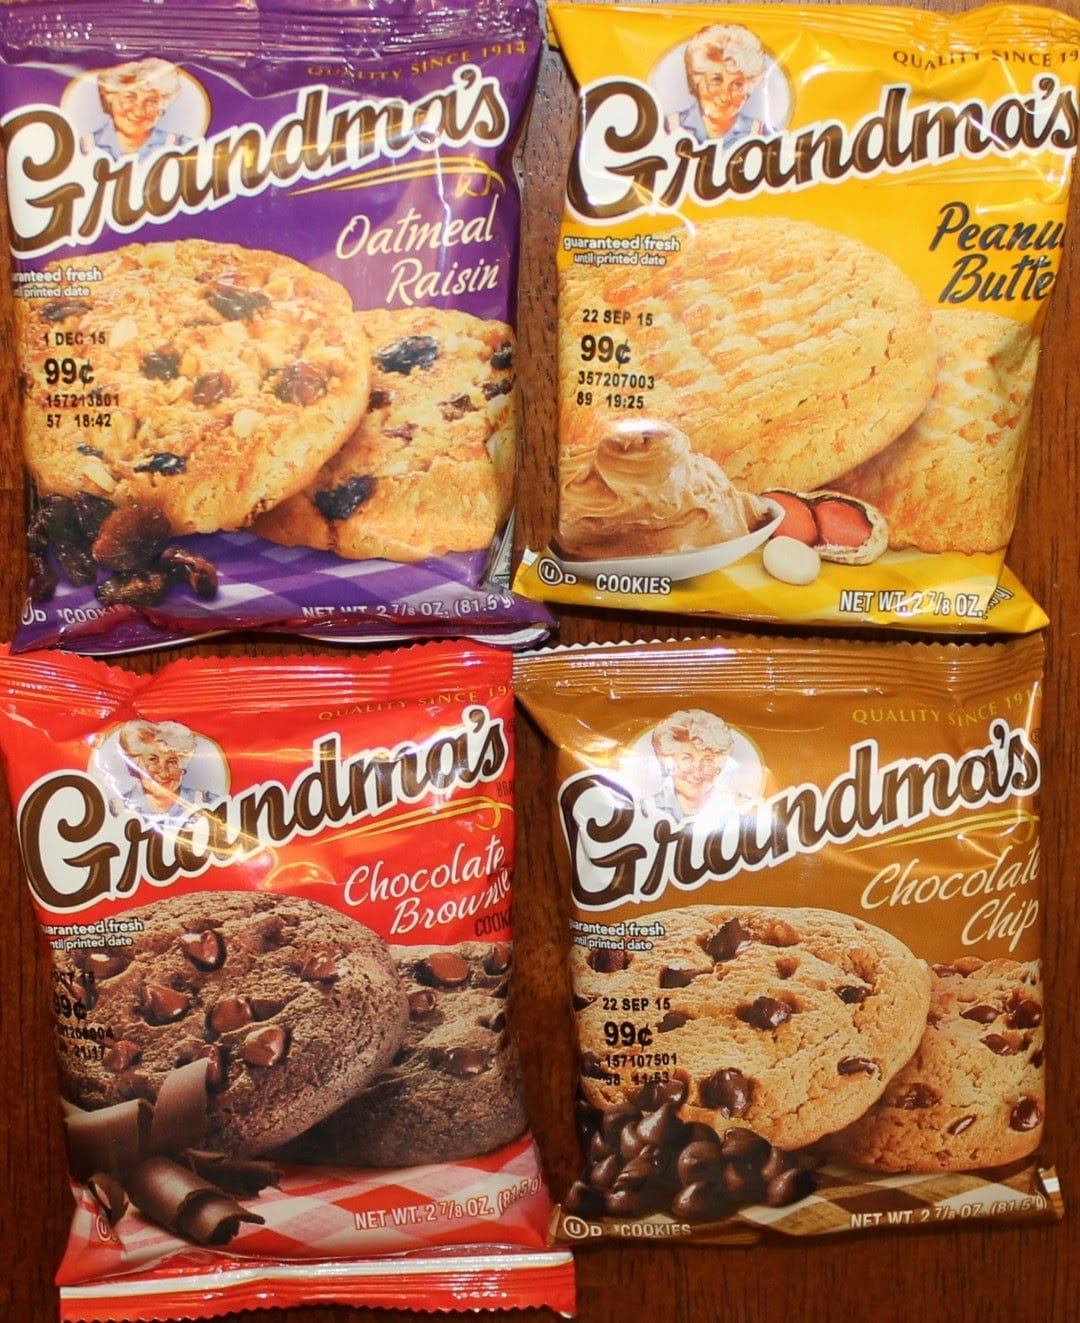 Grandma's Cookies  Oatmeal Raisin, Peanut Butter, Chocolate